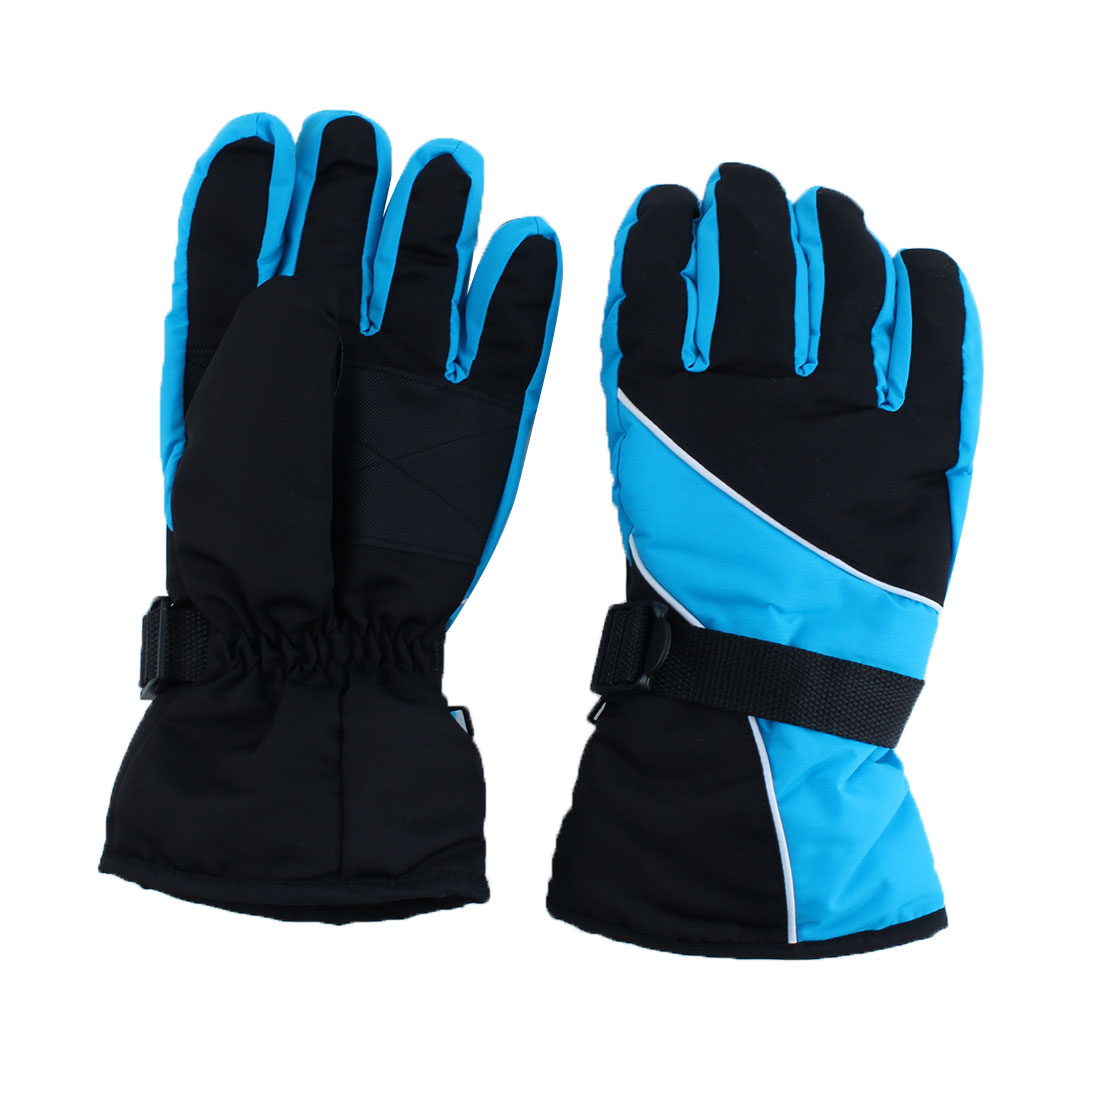 Motorcycle Climbing Winter Snowmobile Ski Gloves Athletic Mitten Light Blue Pair